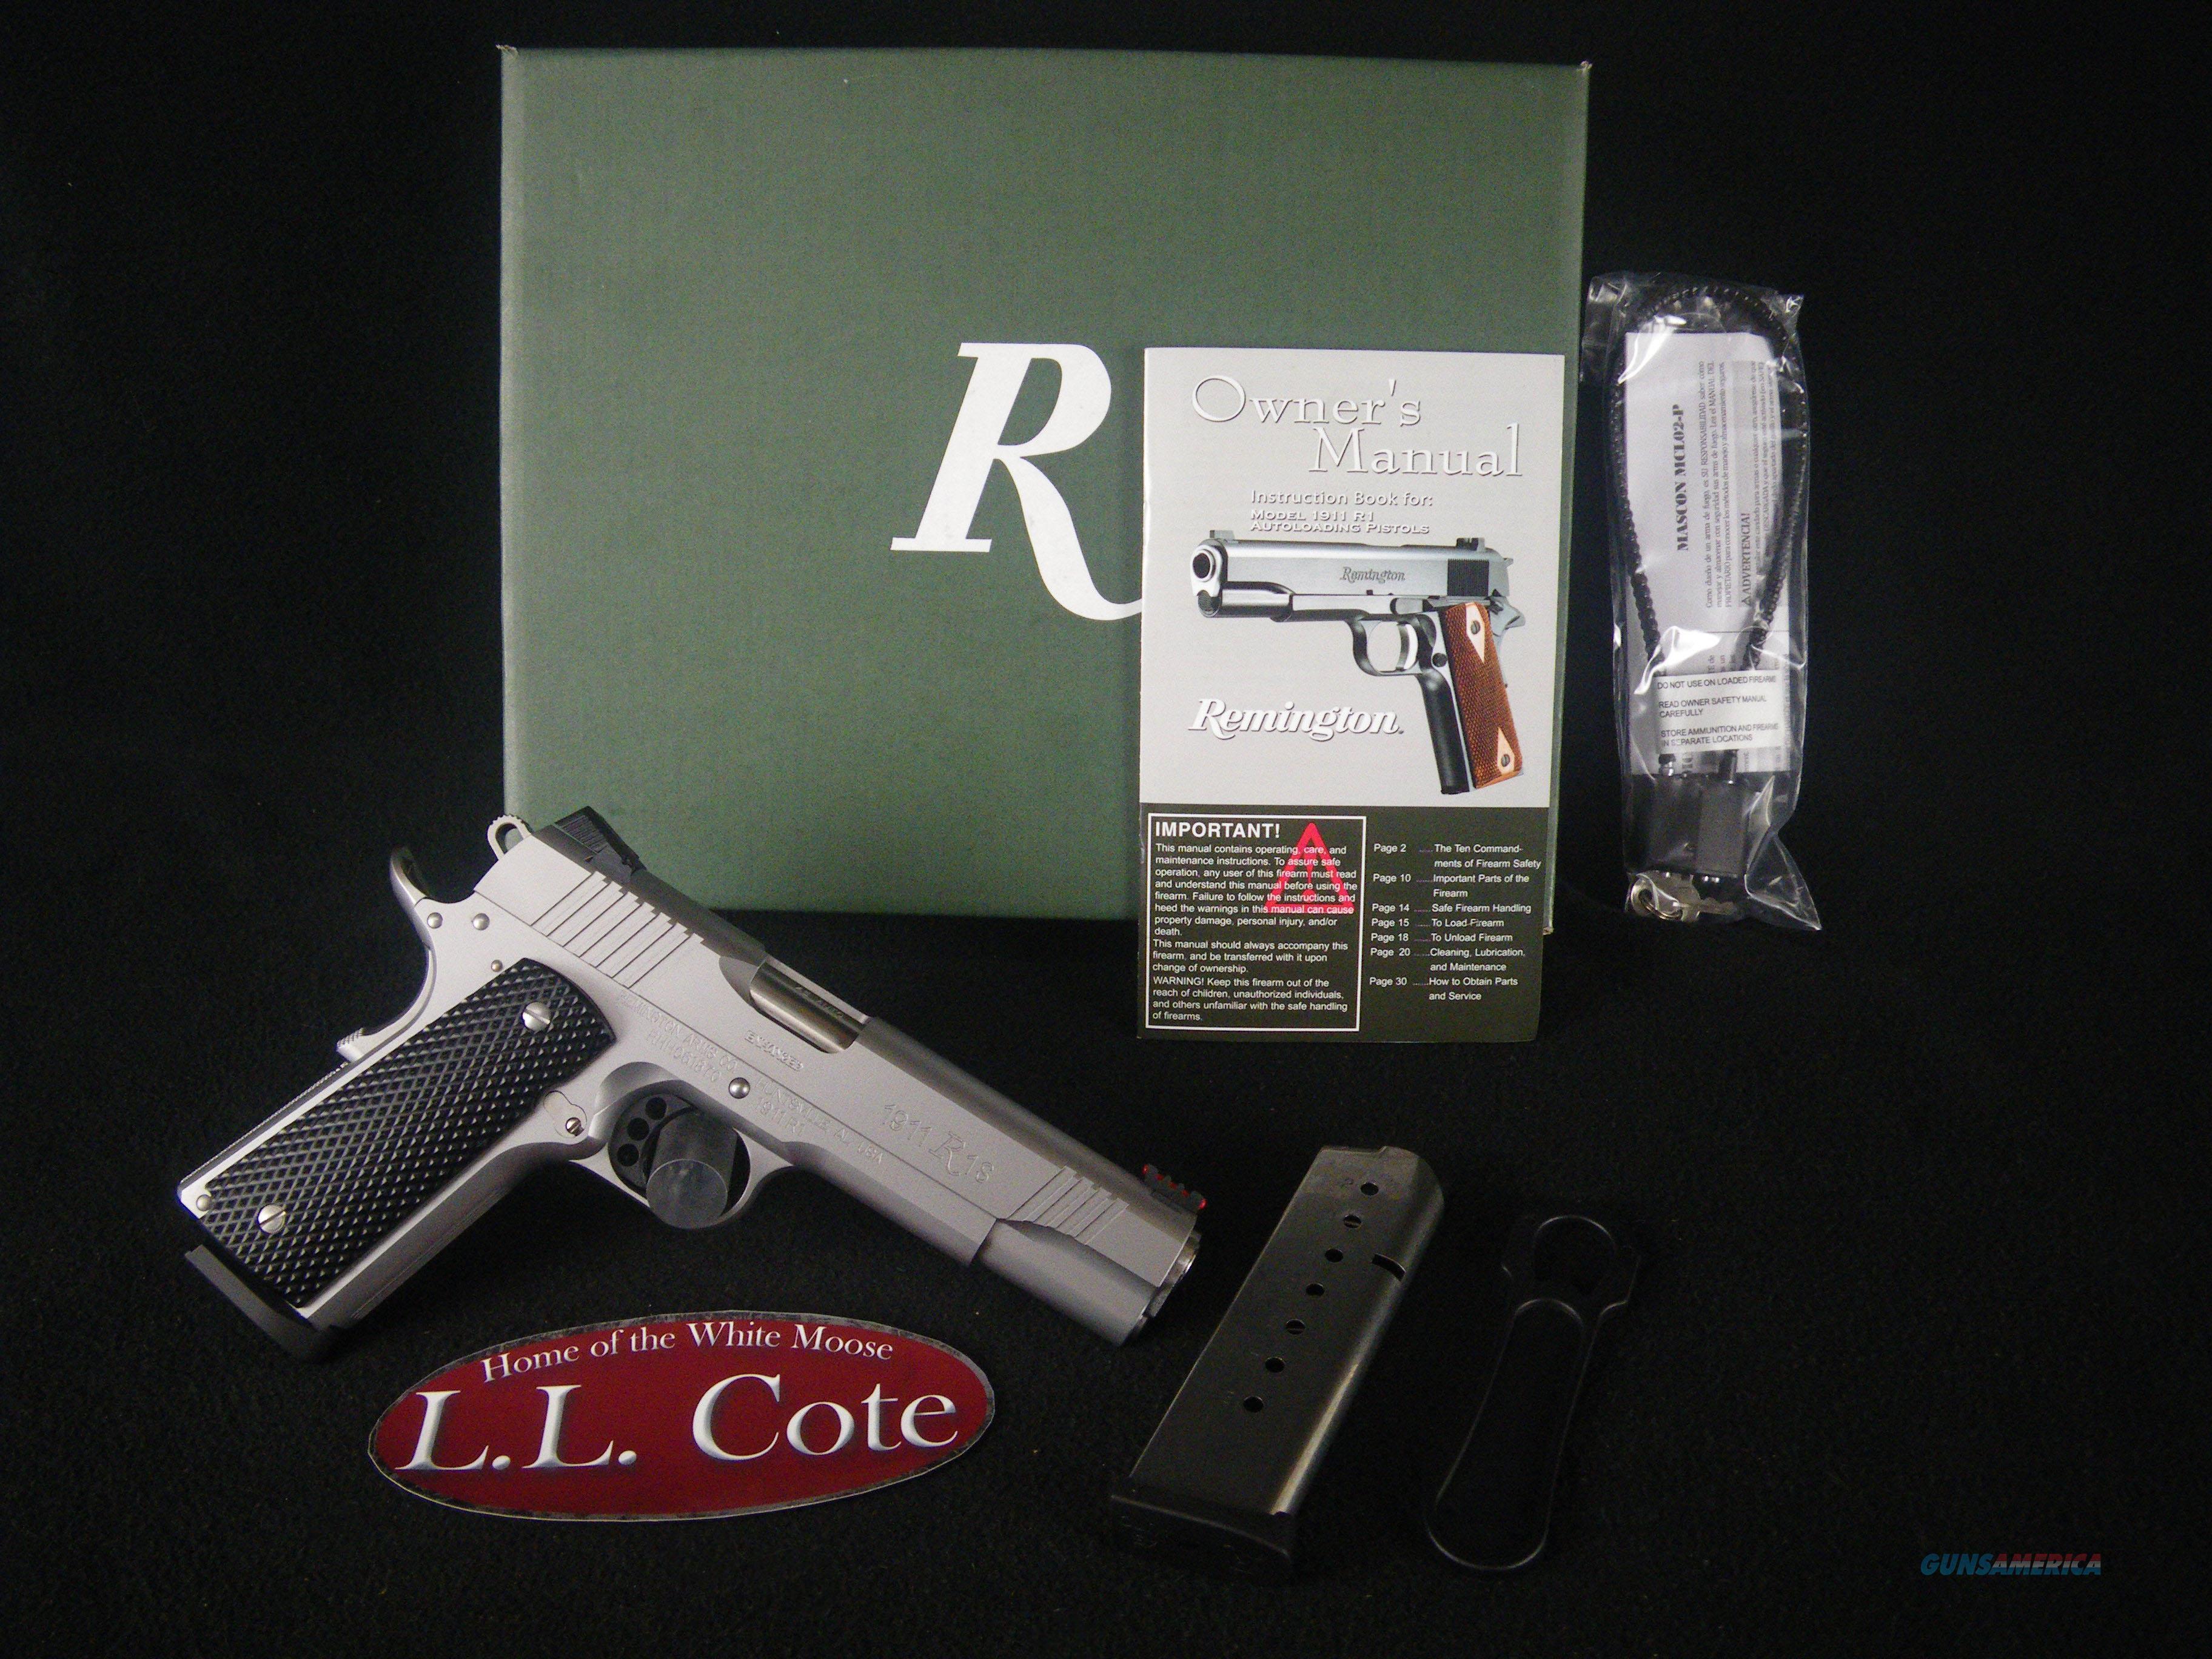 "Remington 1911 R1 Enhanced 45ACP 5"" NEW 96329  Guns > Pistols > Remington Pistols - Modern > 1911"